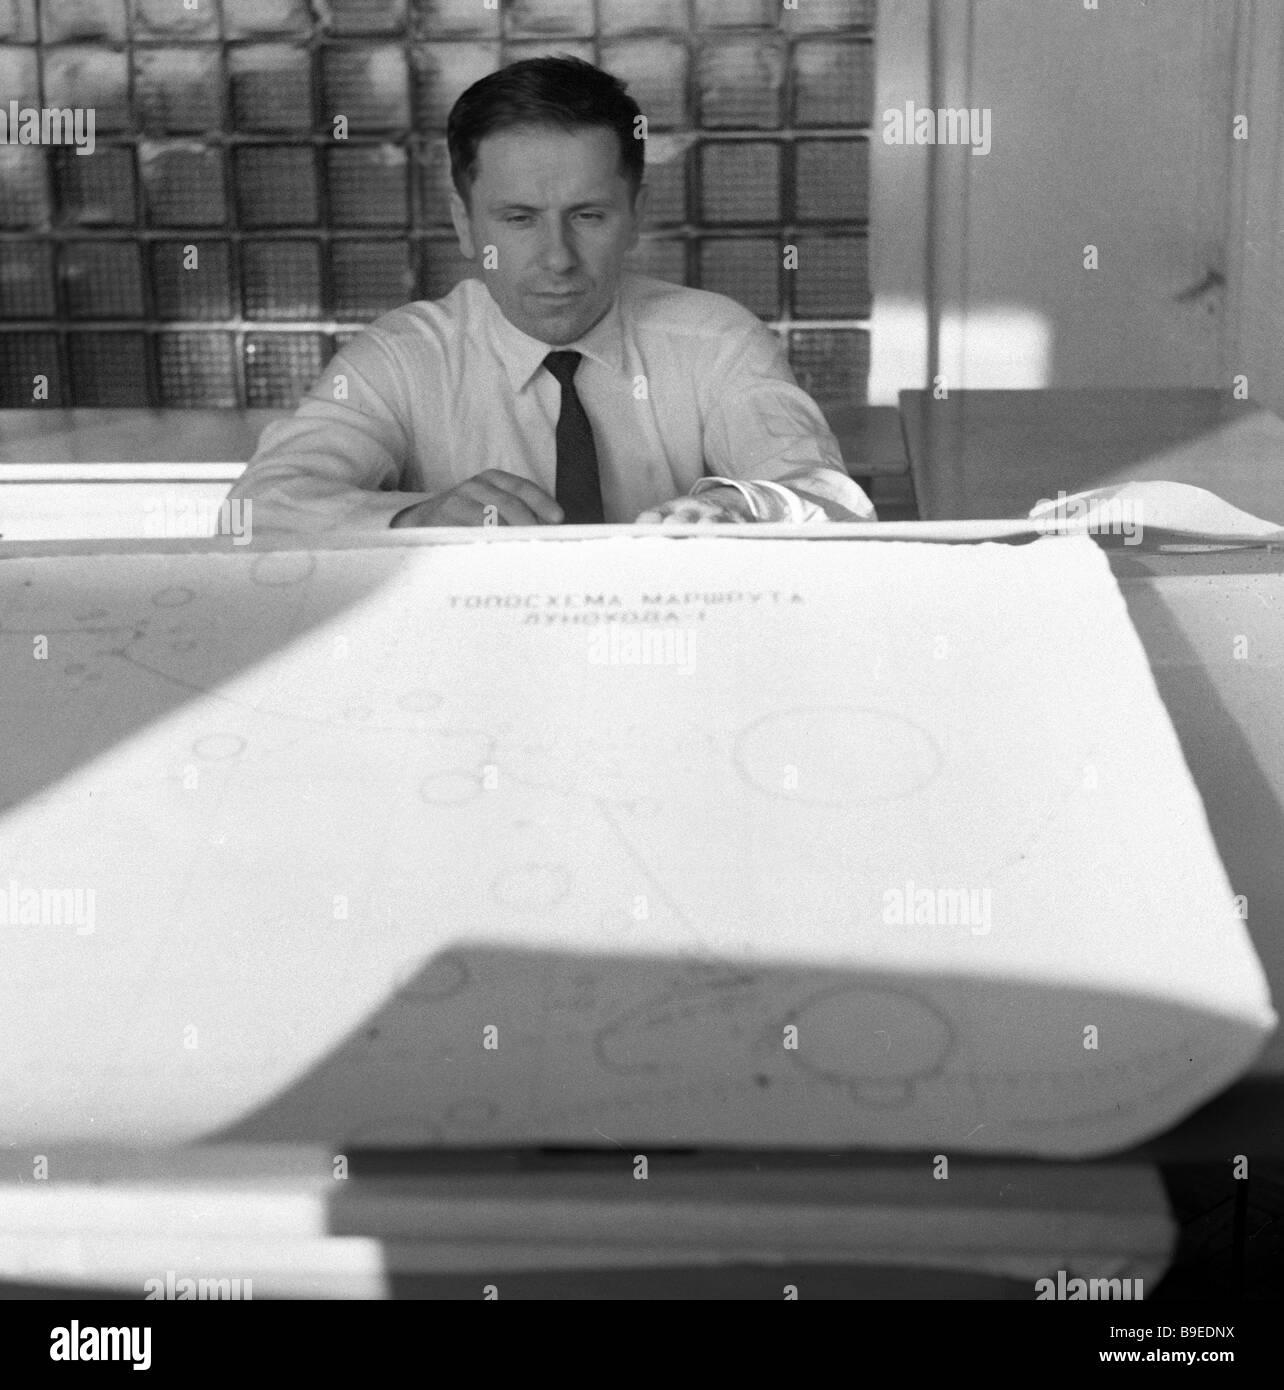 Navigator of the Lunokhod 1 lunar rover plots course - Stock Image